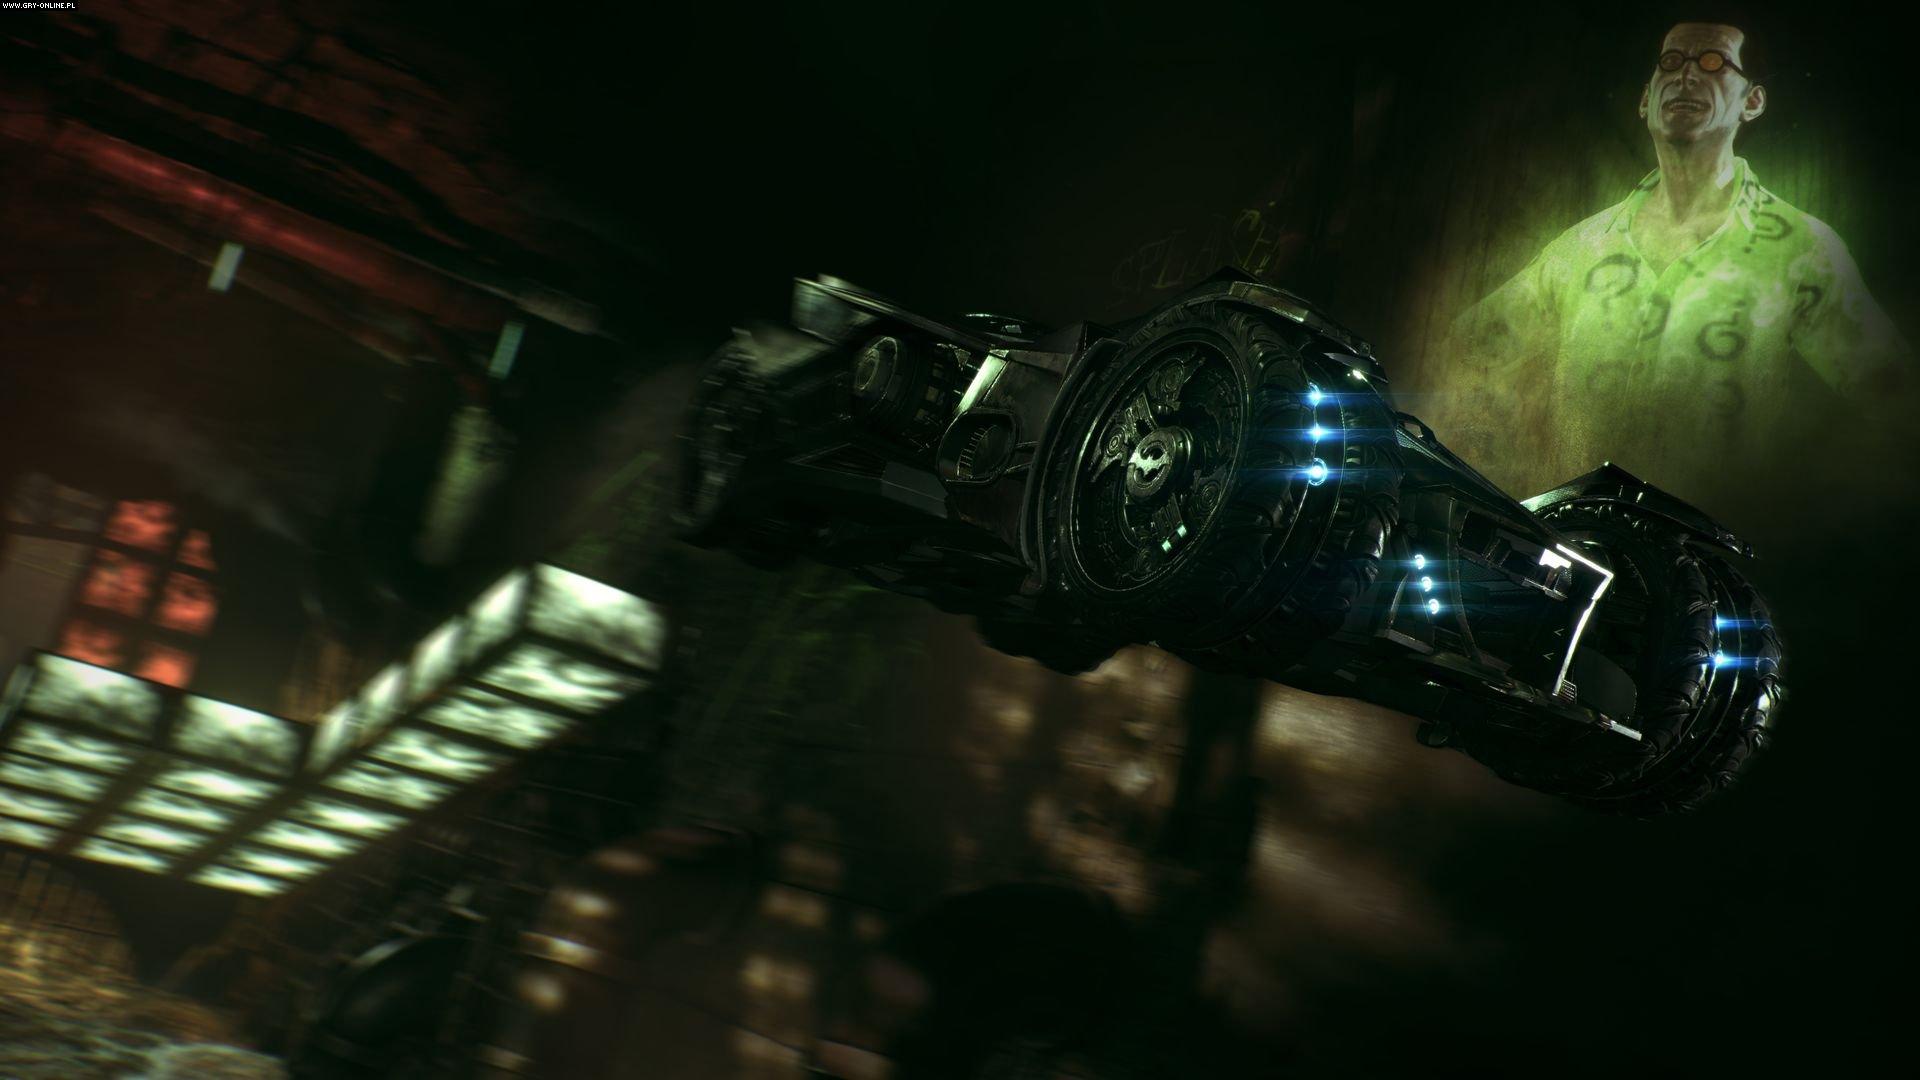 Batman: Arkham Knight PC, PS4, XONE Games Image 8/63, RockSteady Studios, Warner Bros Interactive Entertainment